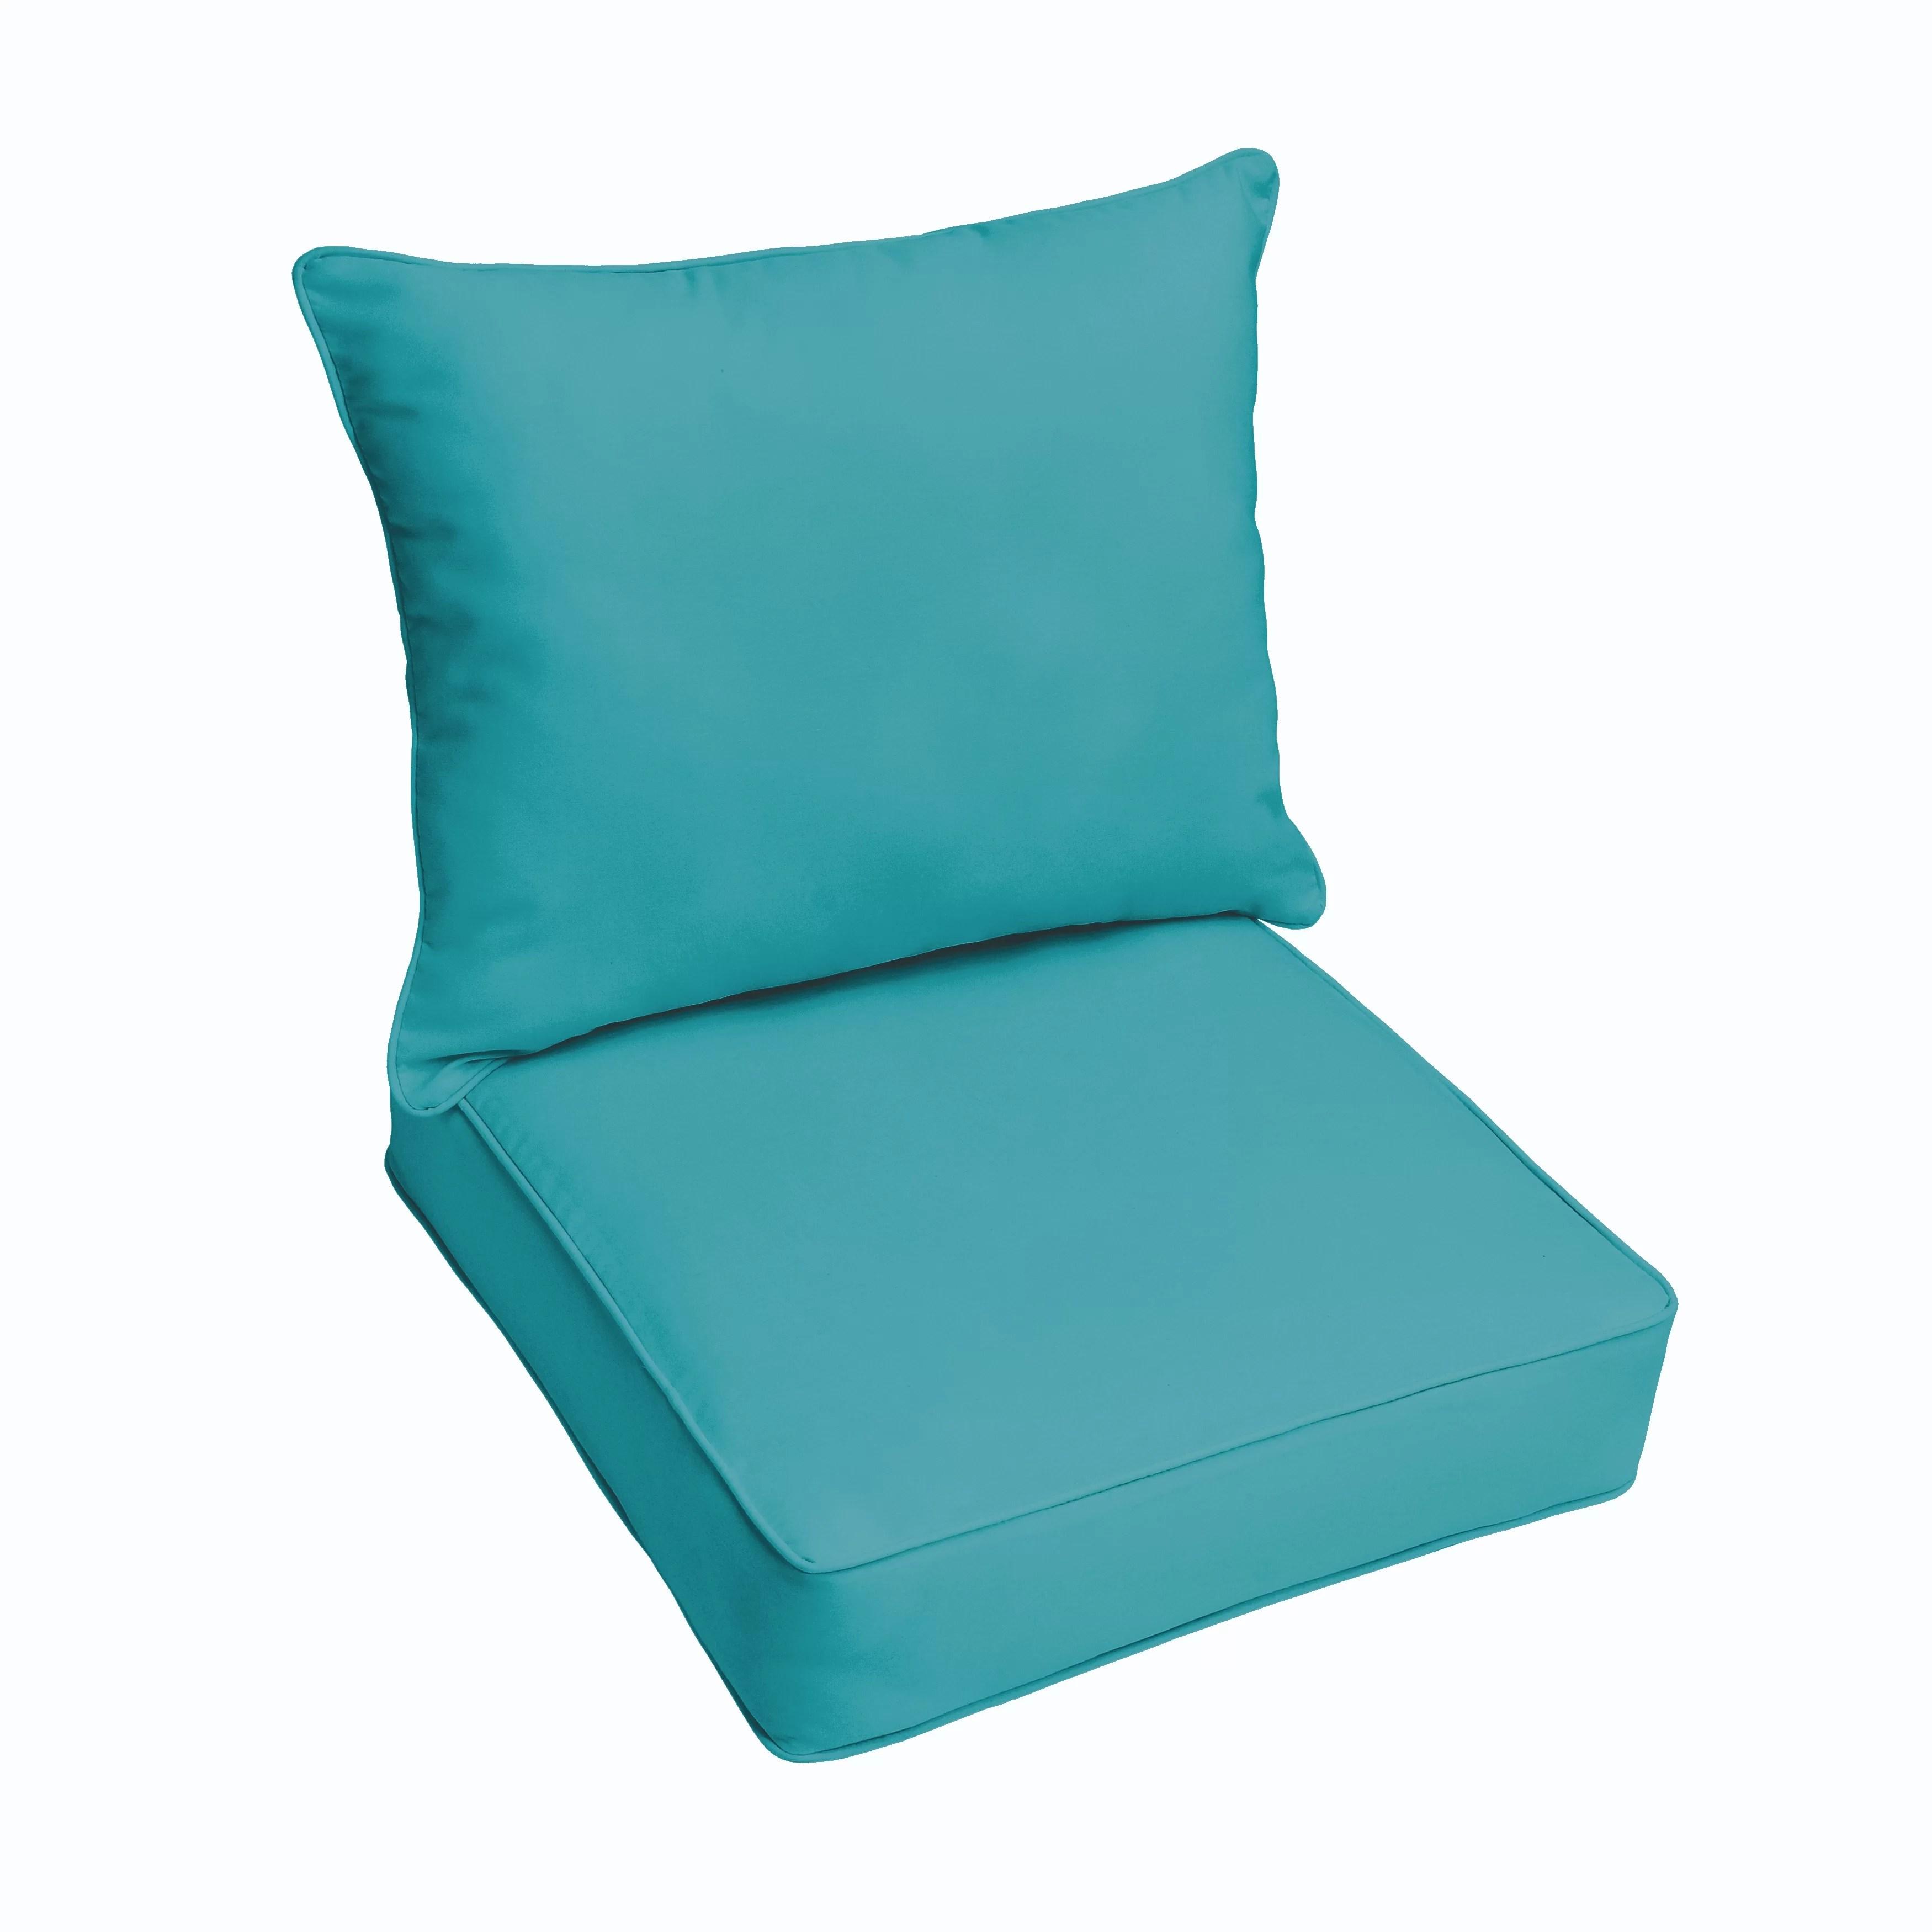 one piece patio chair cushions graco swing youtube beachcrest home 2 outdoor sunbrella cushion